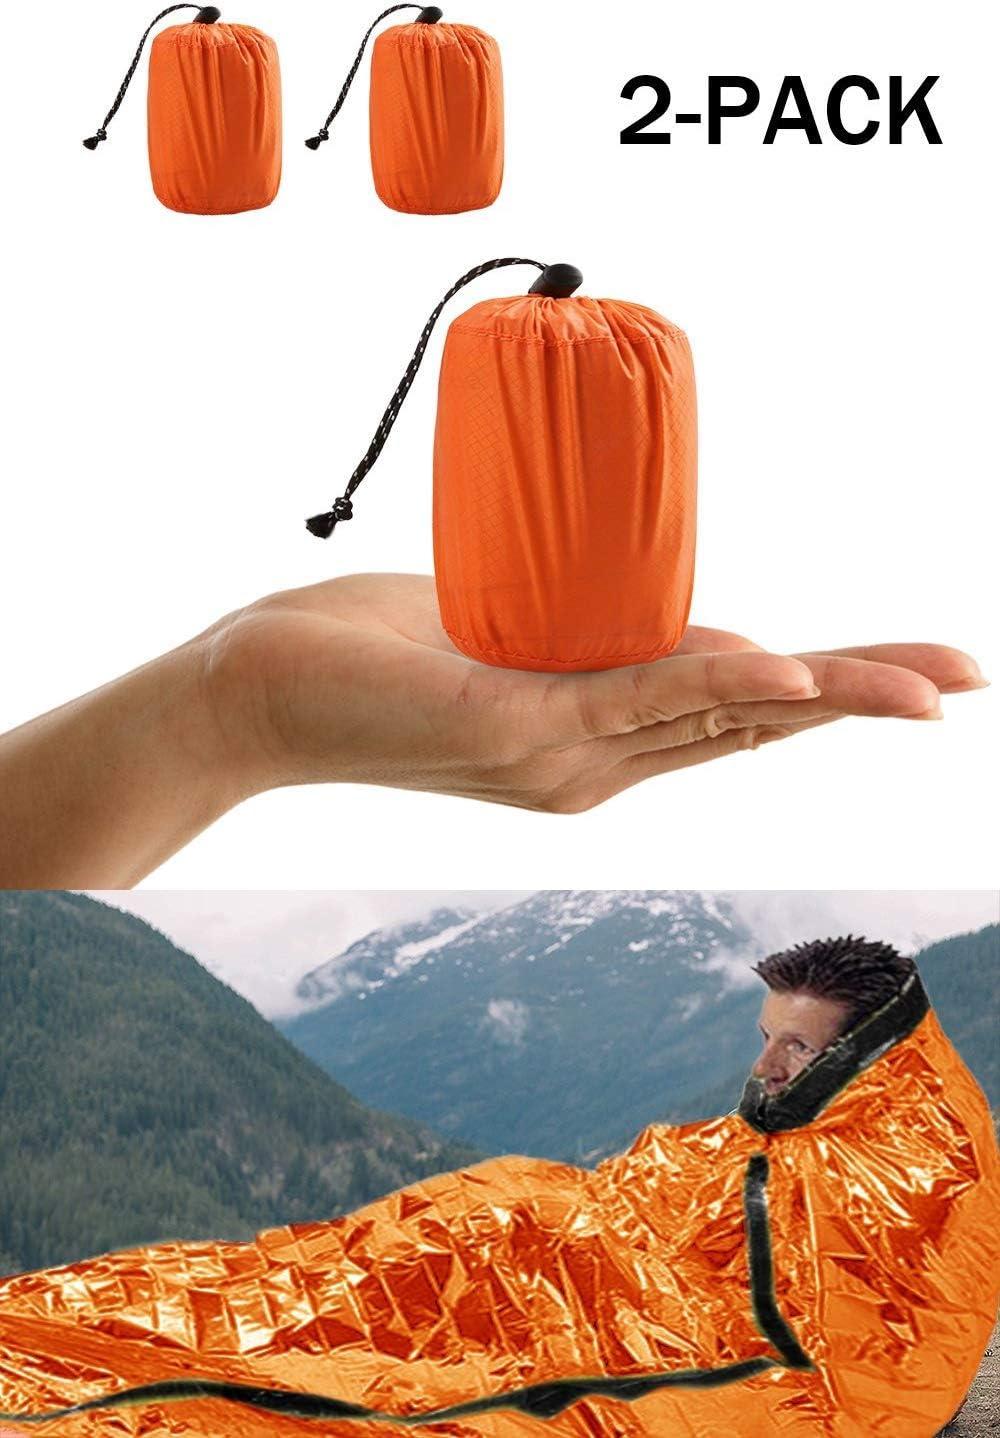 ACVCY Emergency Sleeping Bag, 2PCS LightweightEmergency Bivy Sack Survival Compact Survival Sleeping Bag WaterproofThermal Emergency Blanket Multi-use Survival Gear for Outdoor, Hiking, Camping: Home & Kitchen